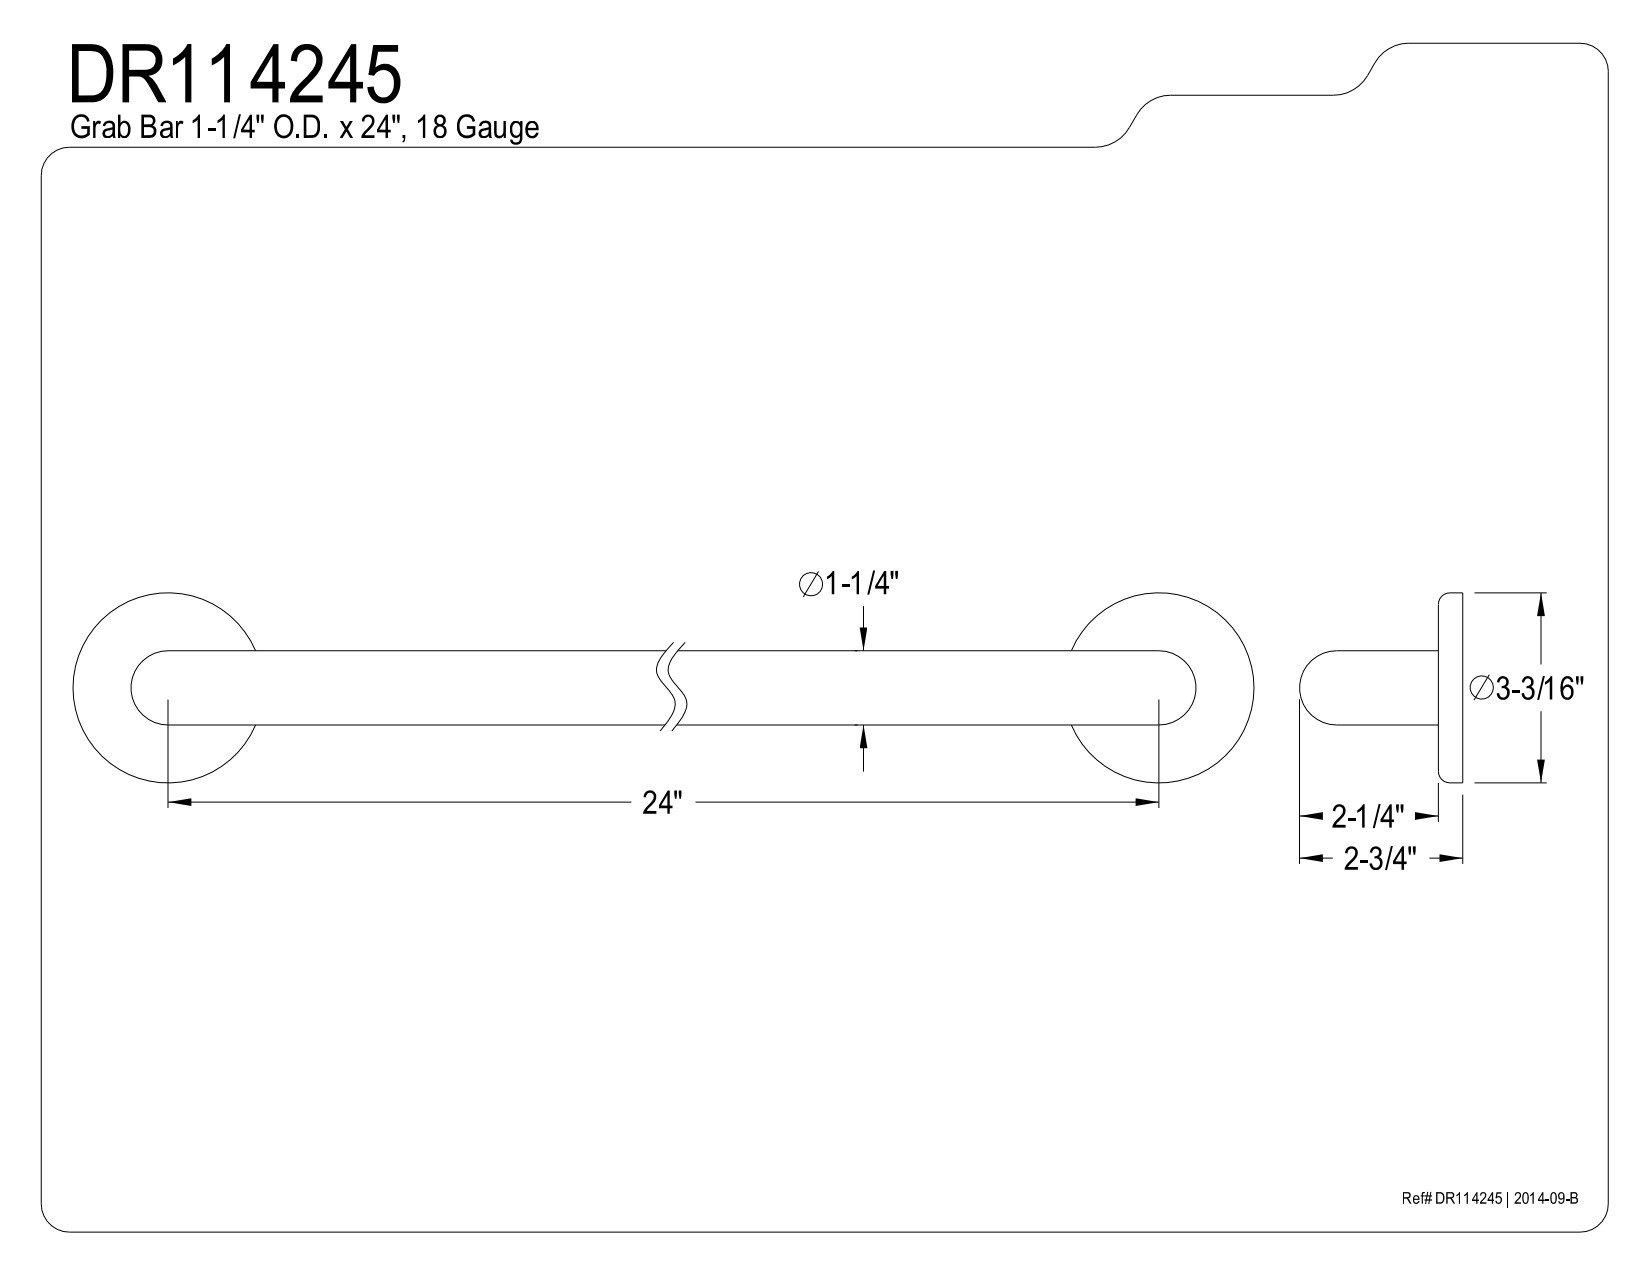 Kingston Brass DR114245 Designer Trimscape Americana Decor 24-Inch Grab Bar with 1.25-Inch Outer Diameter, Oil Rubbed Bronze